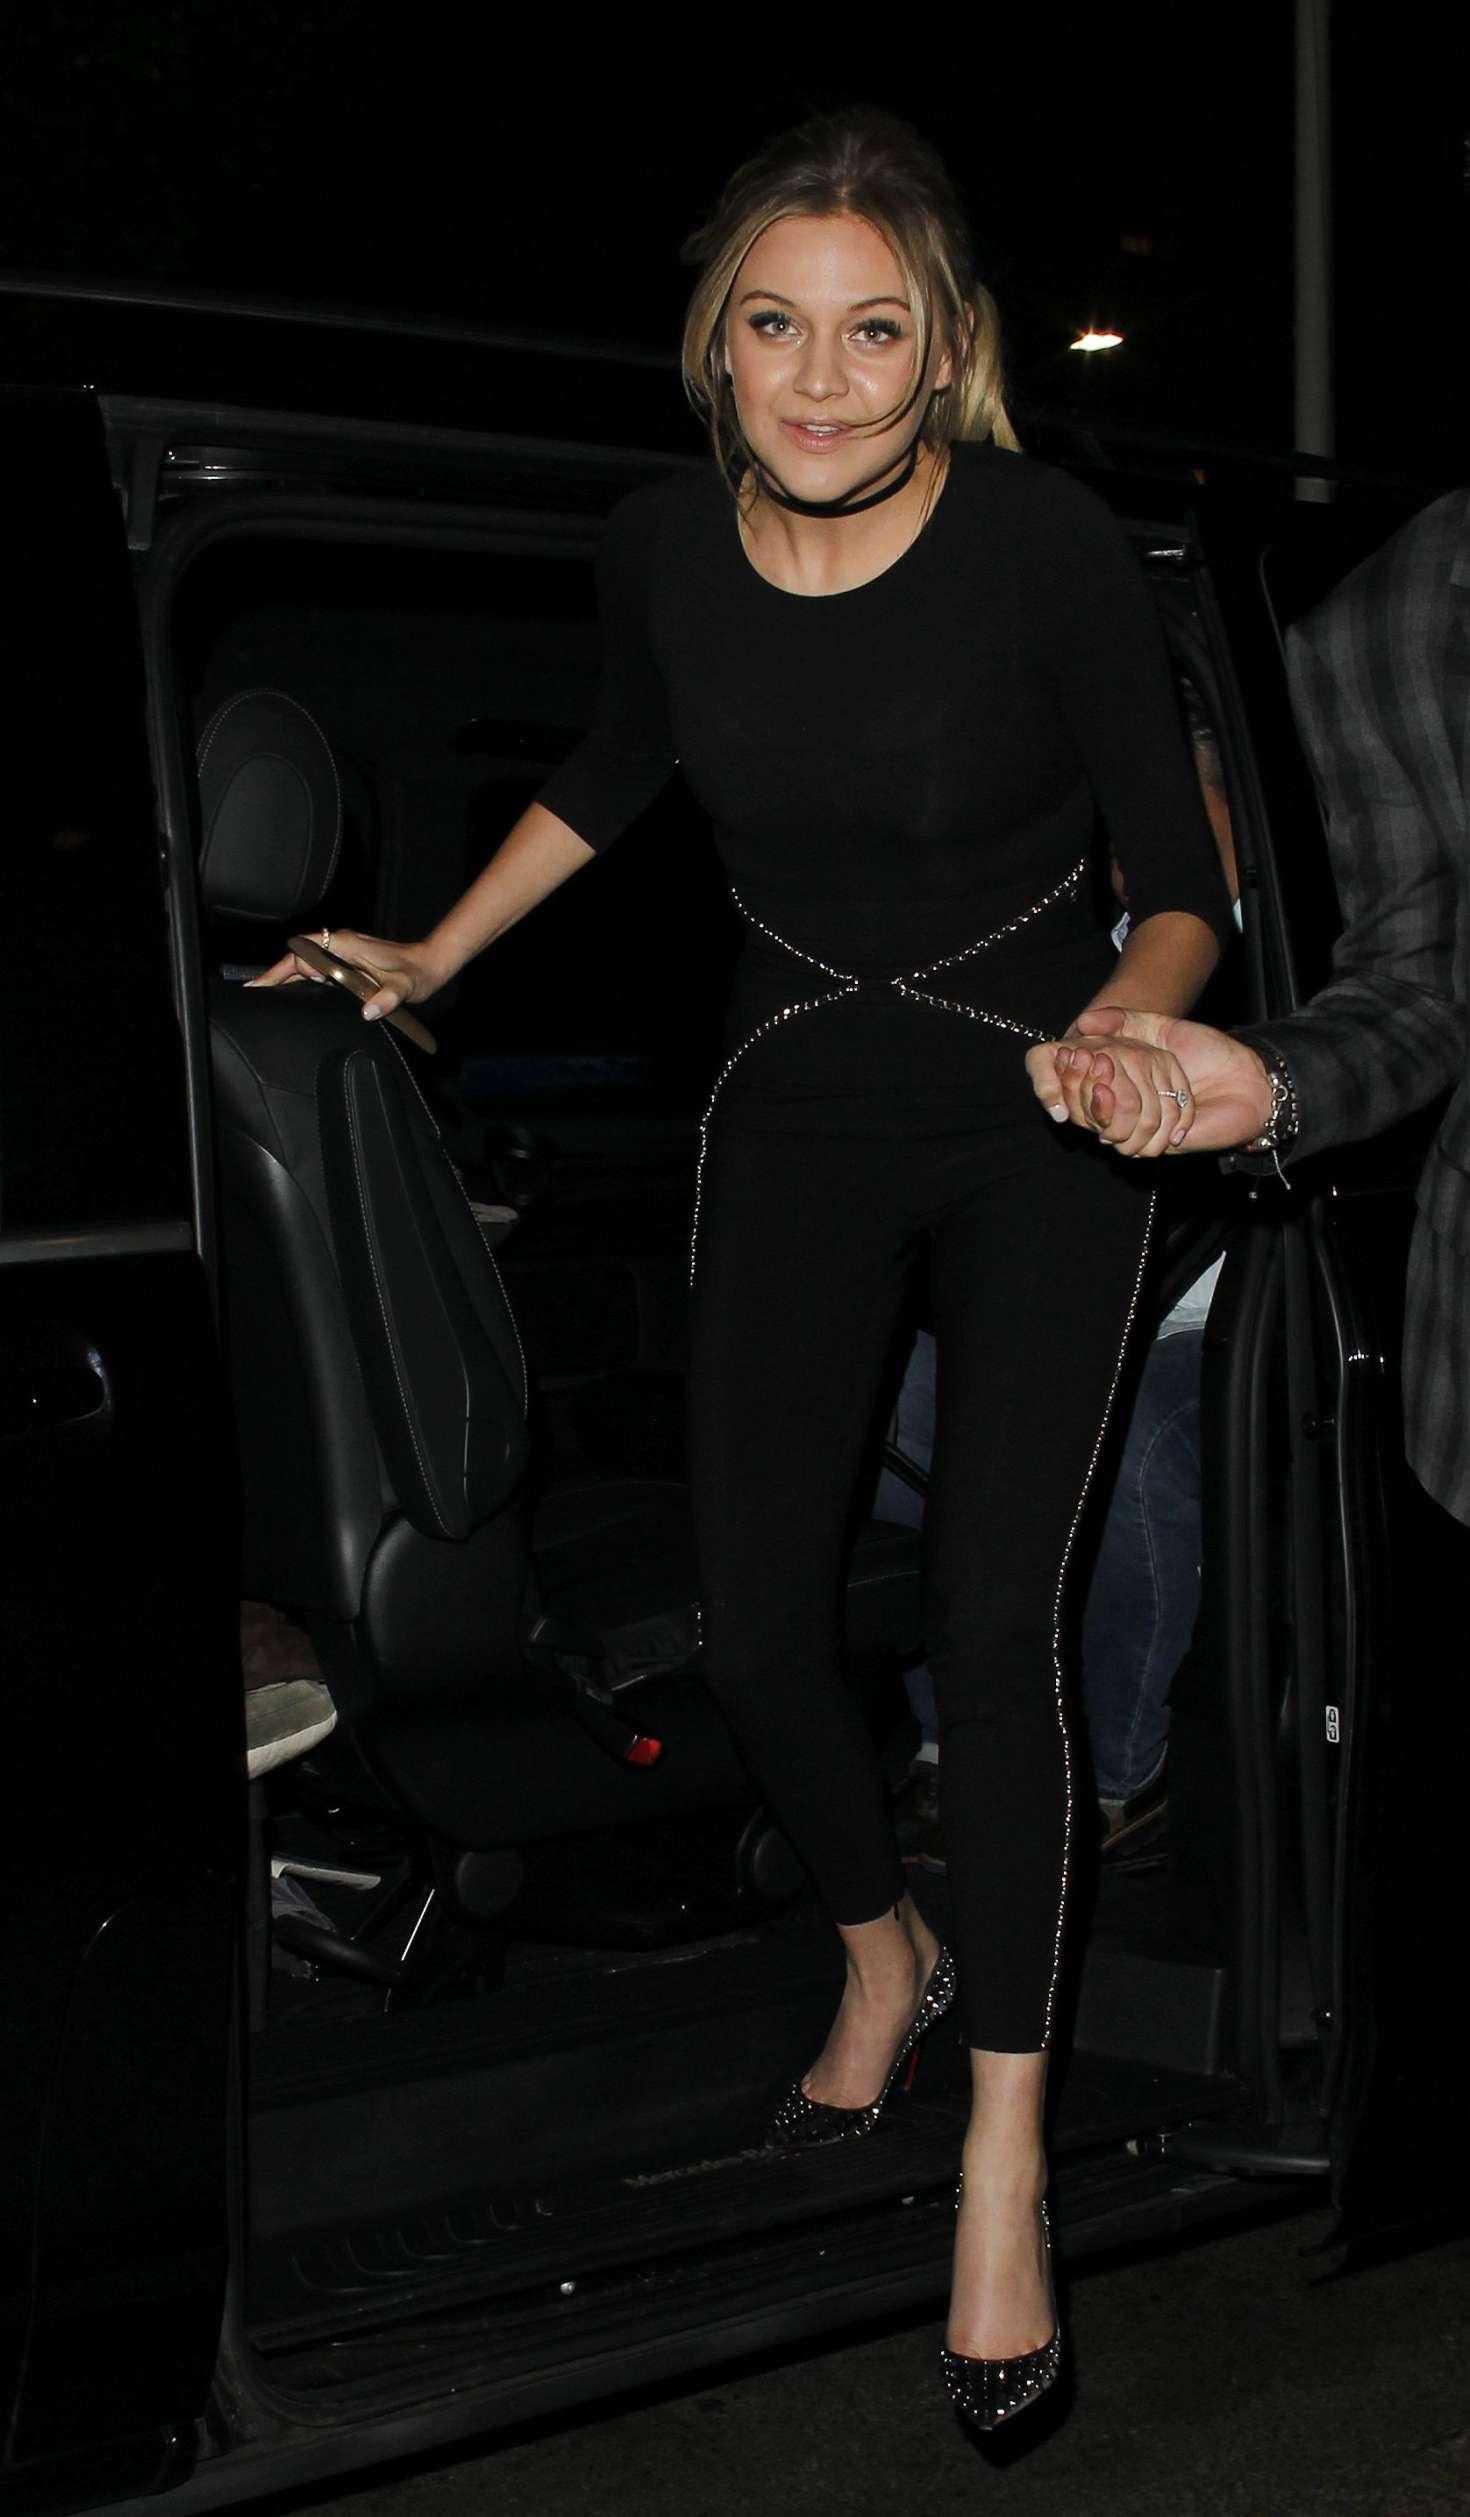 Kelsea Ballerini - Arriving at Her Hotel in Mayfair